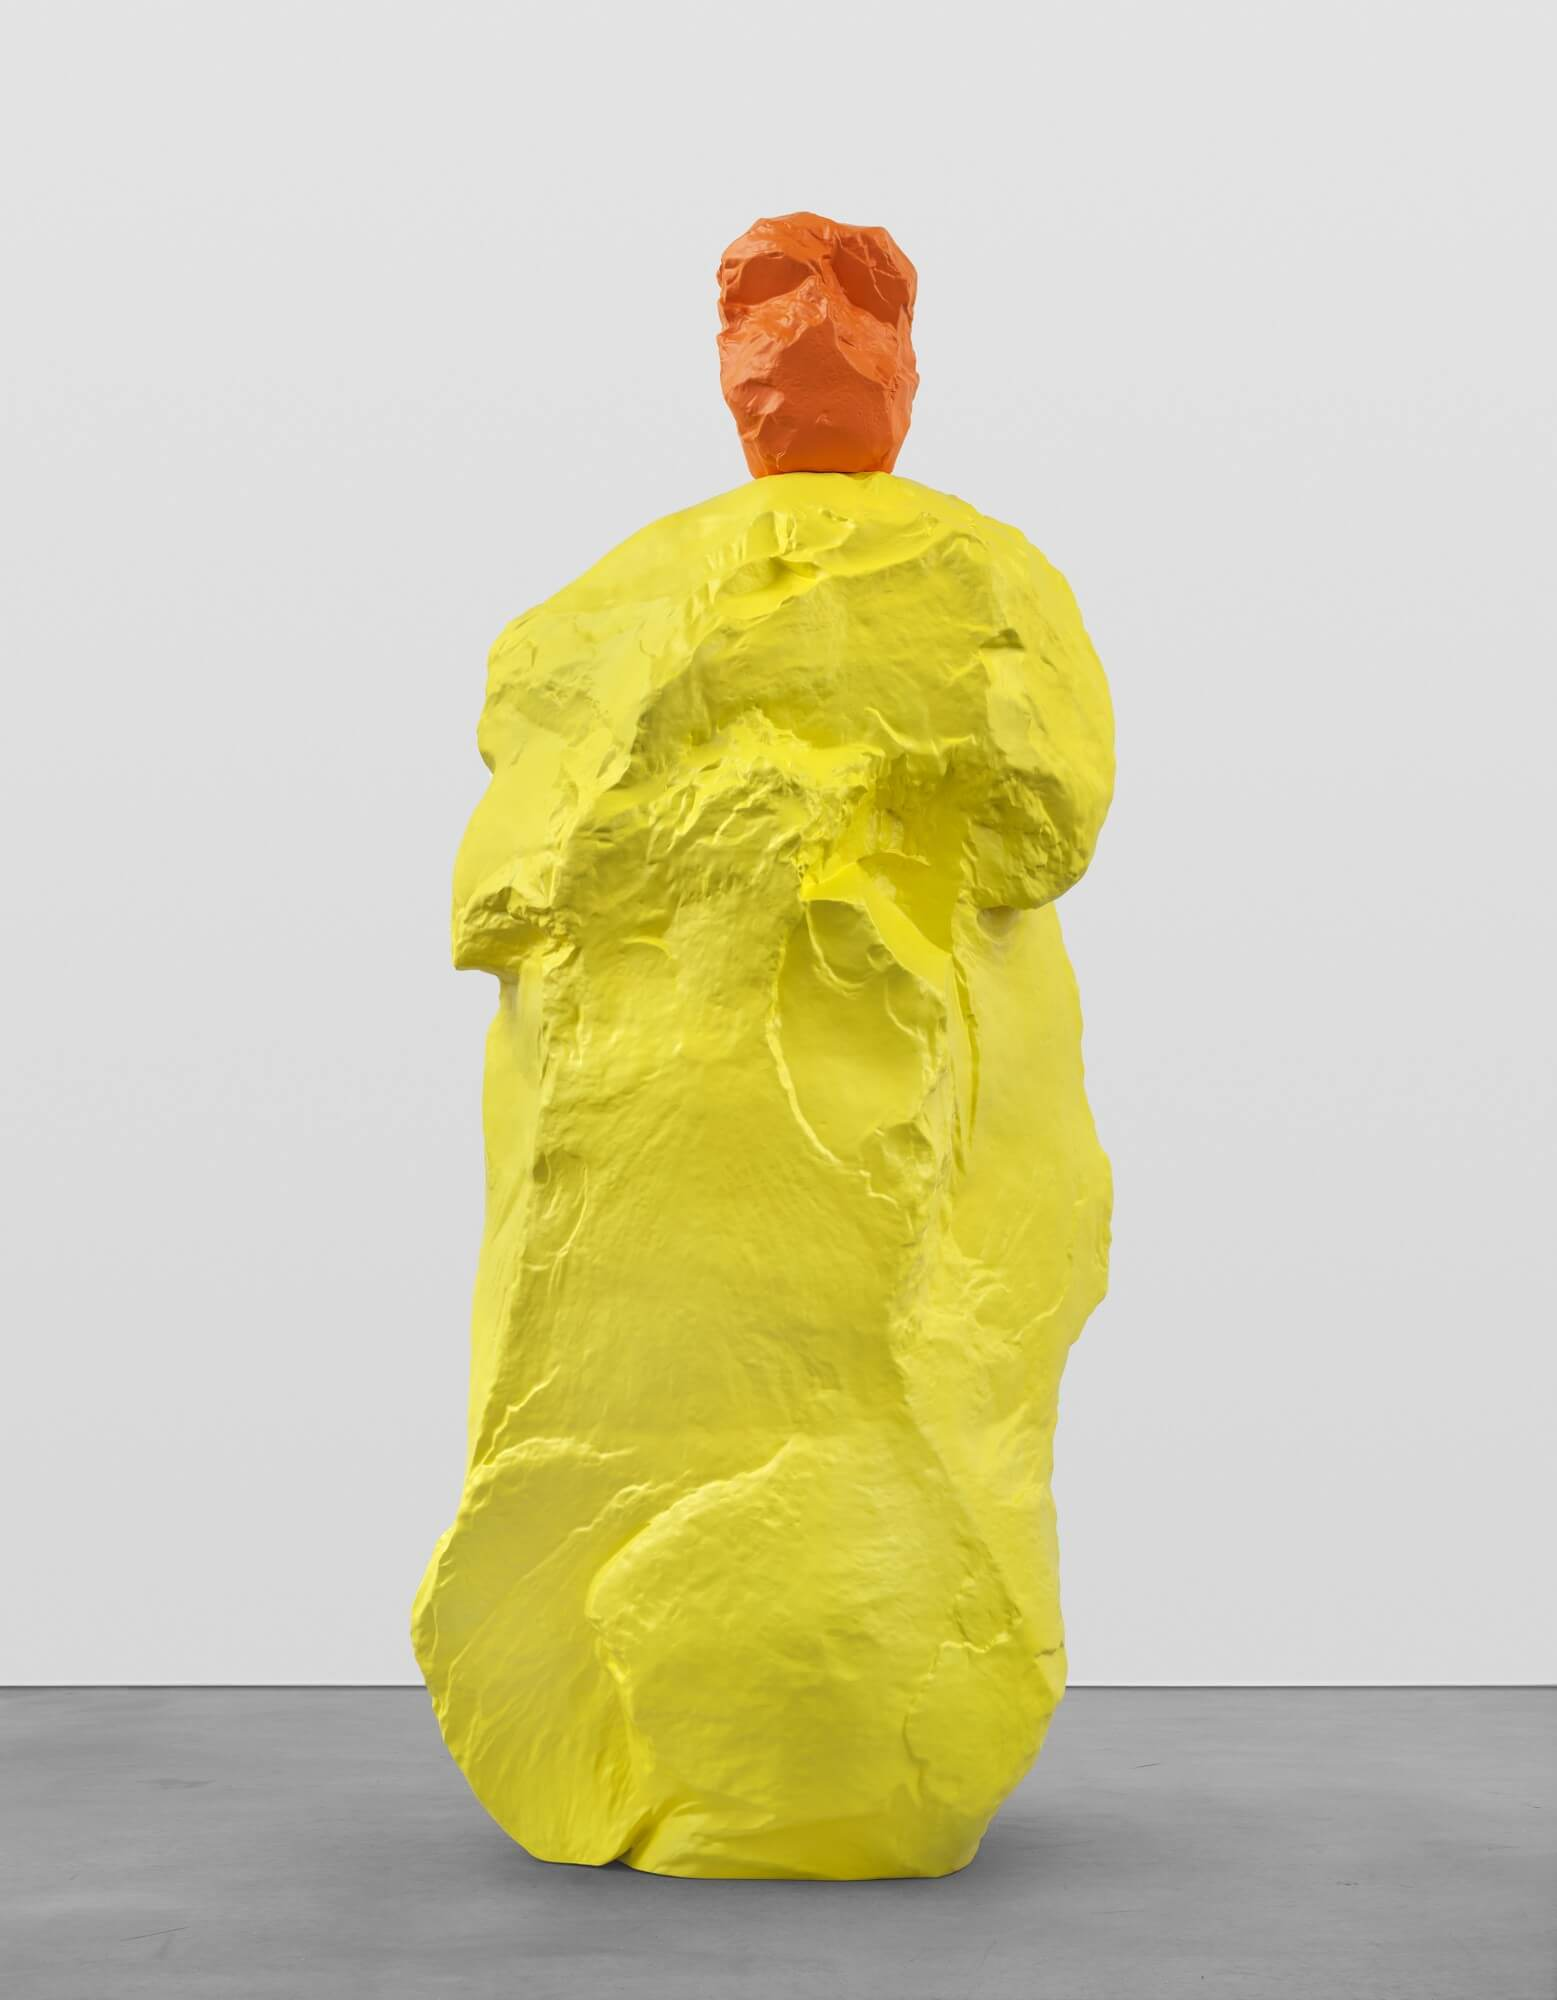 orange yellow monk | UGO RONDINONE